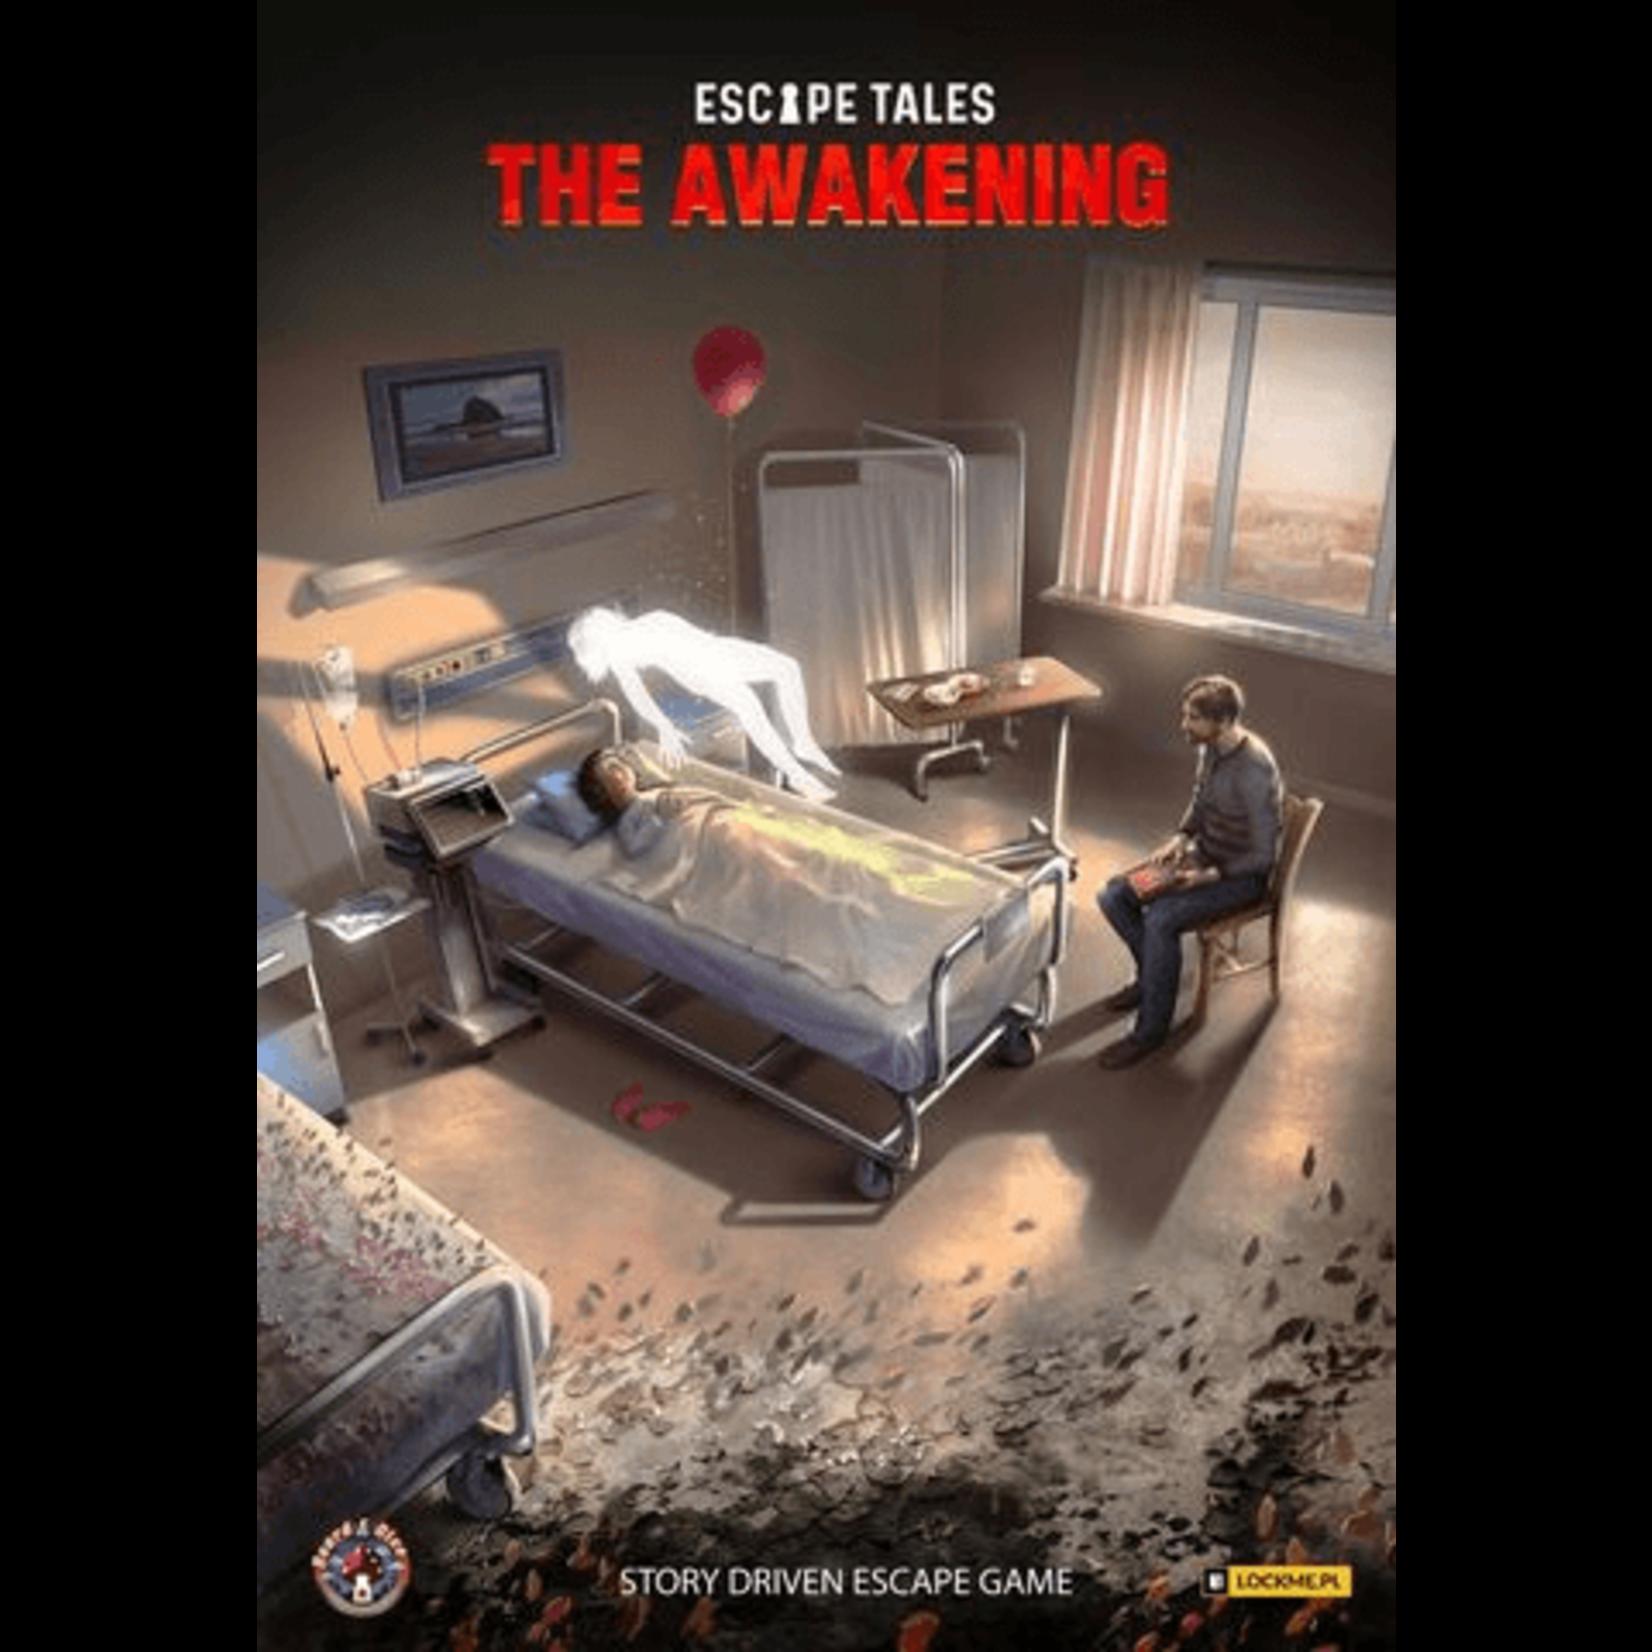 Board & Dice Escape Tales: The Awakening